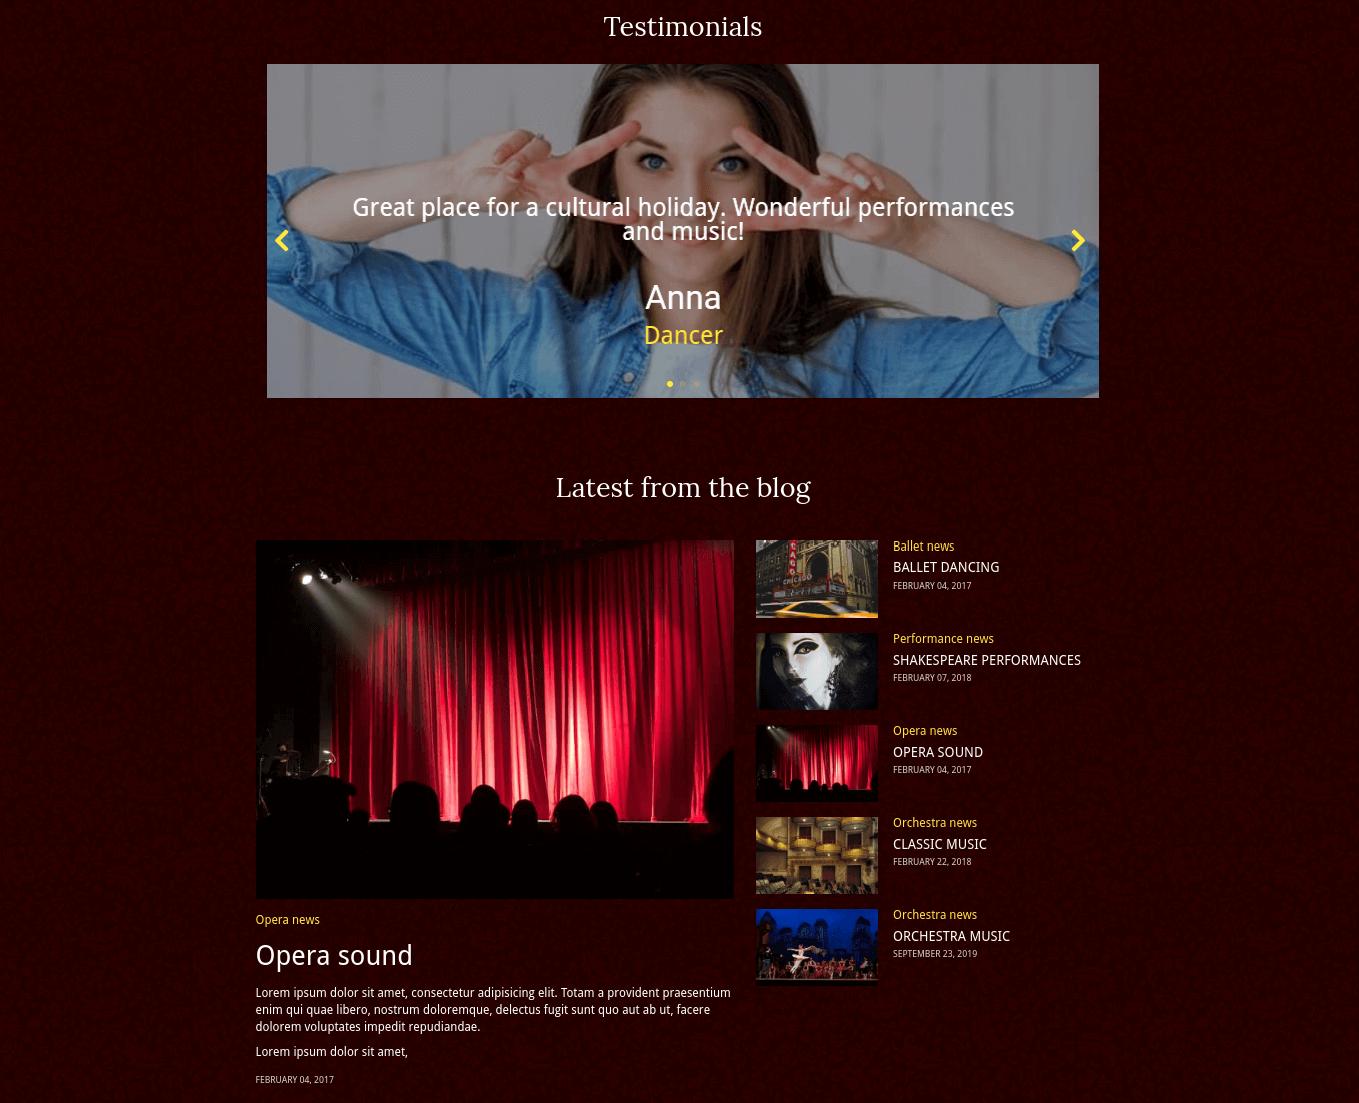 theater website template testimonials and blog